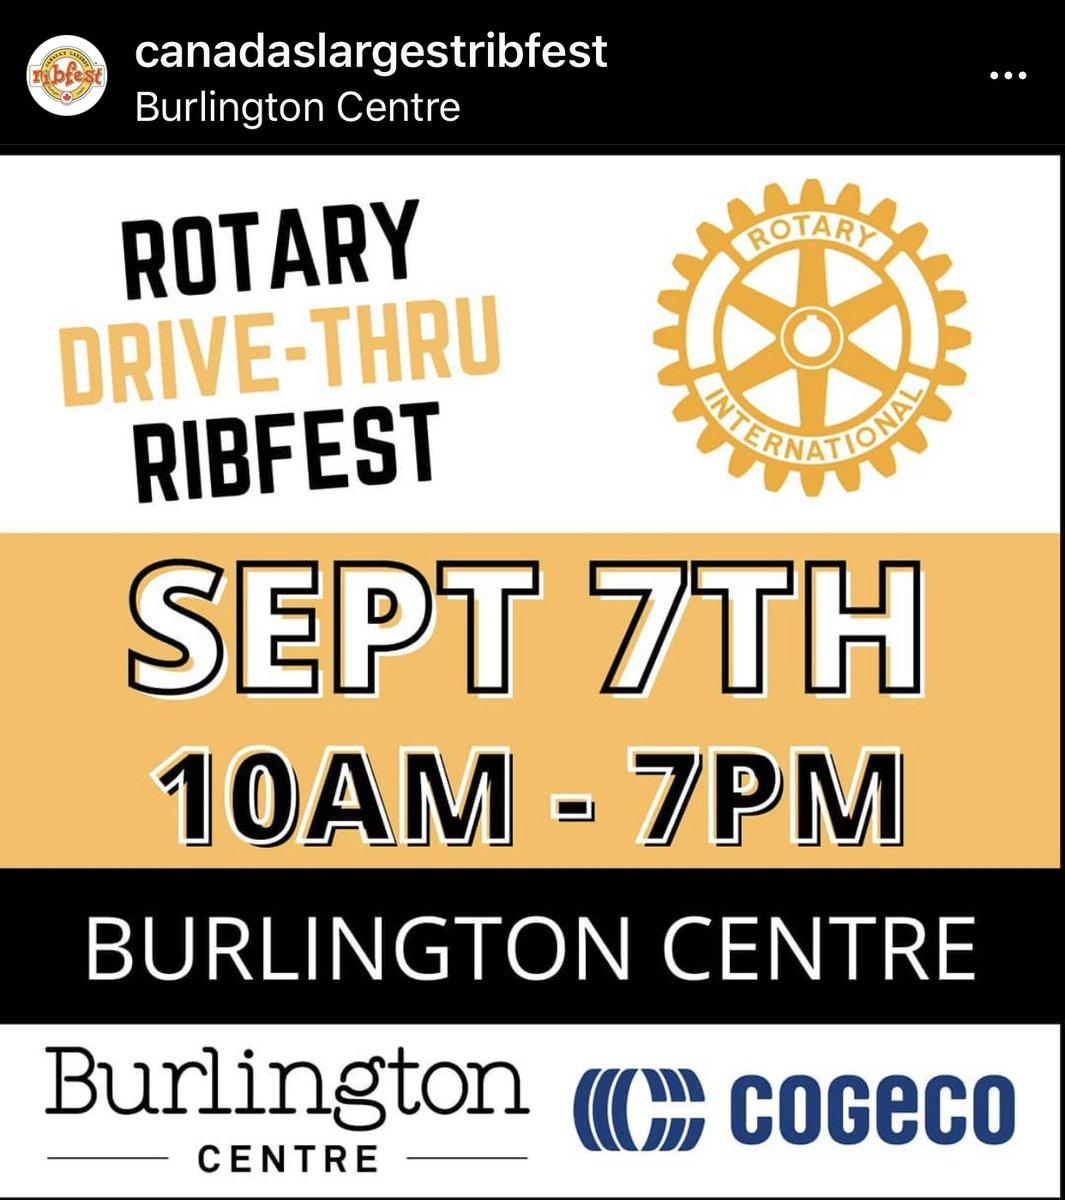 Labour Day's Street Food Locations: https://t.co/JdQOvD6Sp5 #FoodTruckEats #Toronto #BurlON #HamOnt #Niagara #WRAwesome #Whitby, #Ottawa #OntStreetFood @Ribfest @BurlingtonCntr  @TasteofBurl @RotaryBurlOnLS https://t.co/qoEWSbq41h